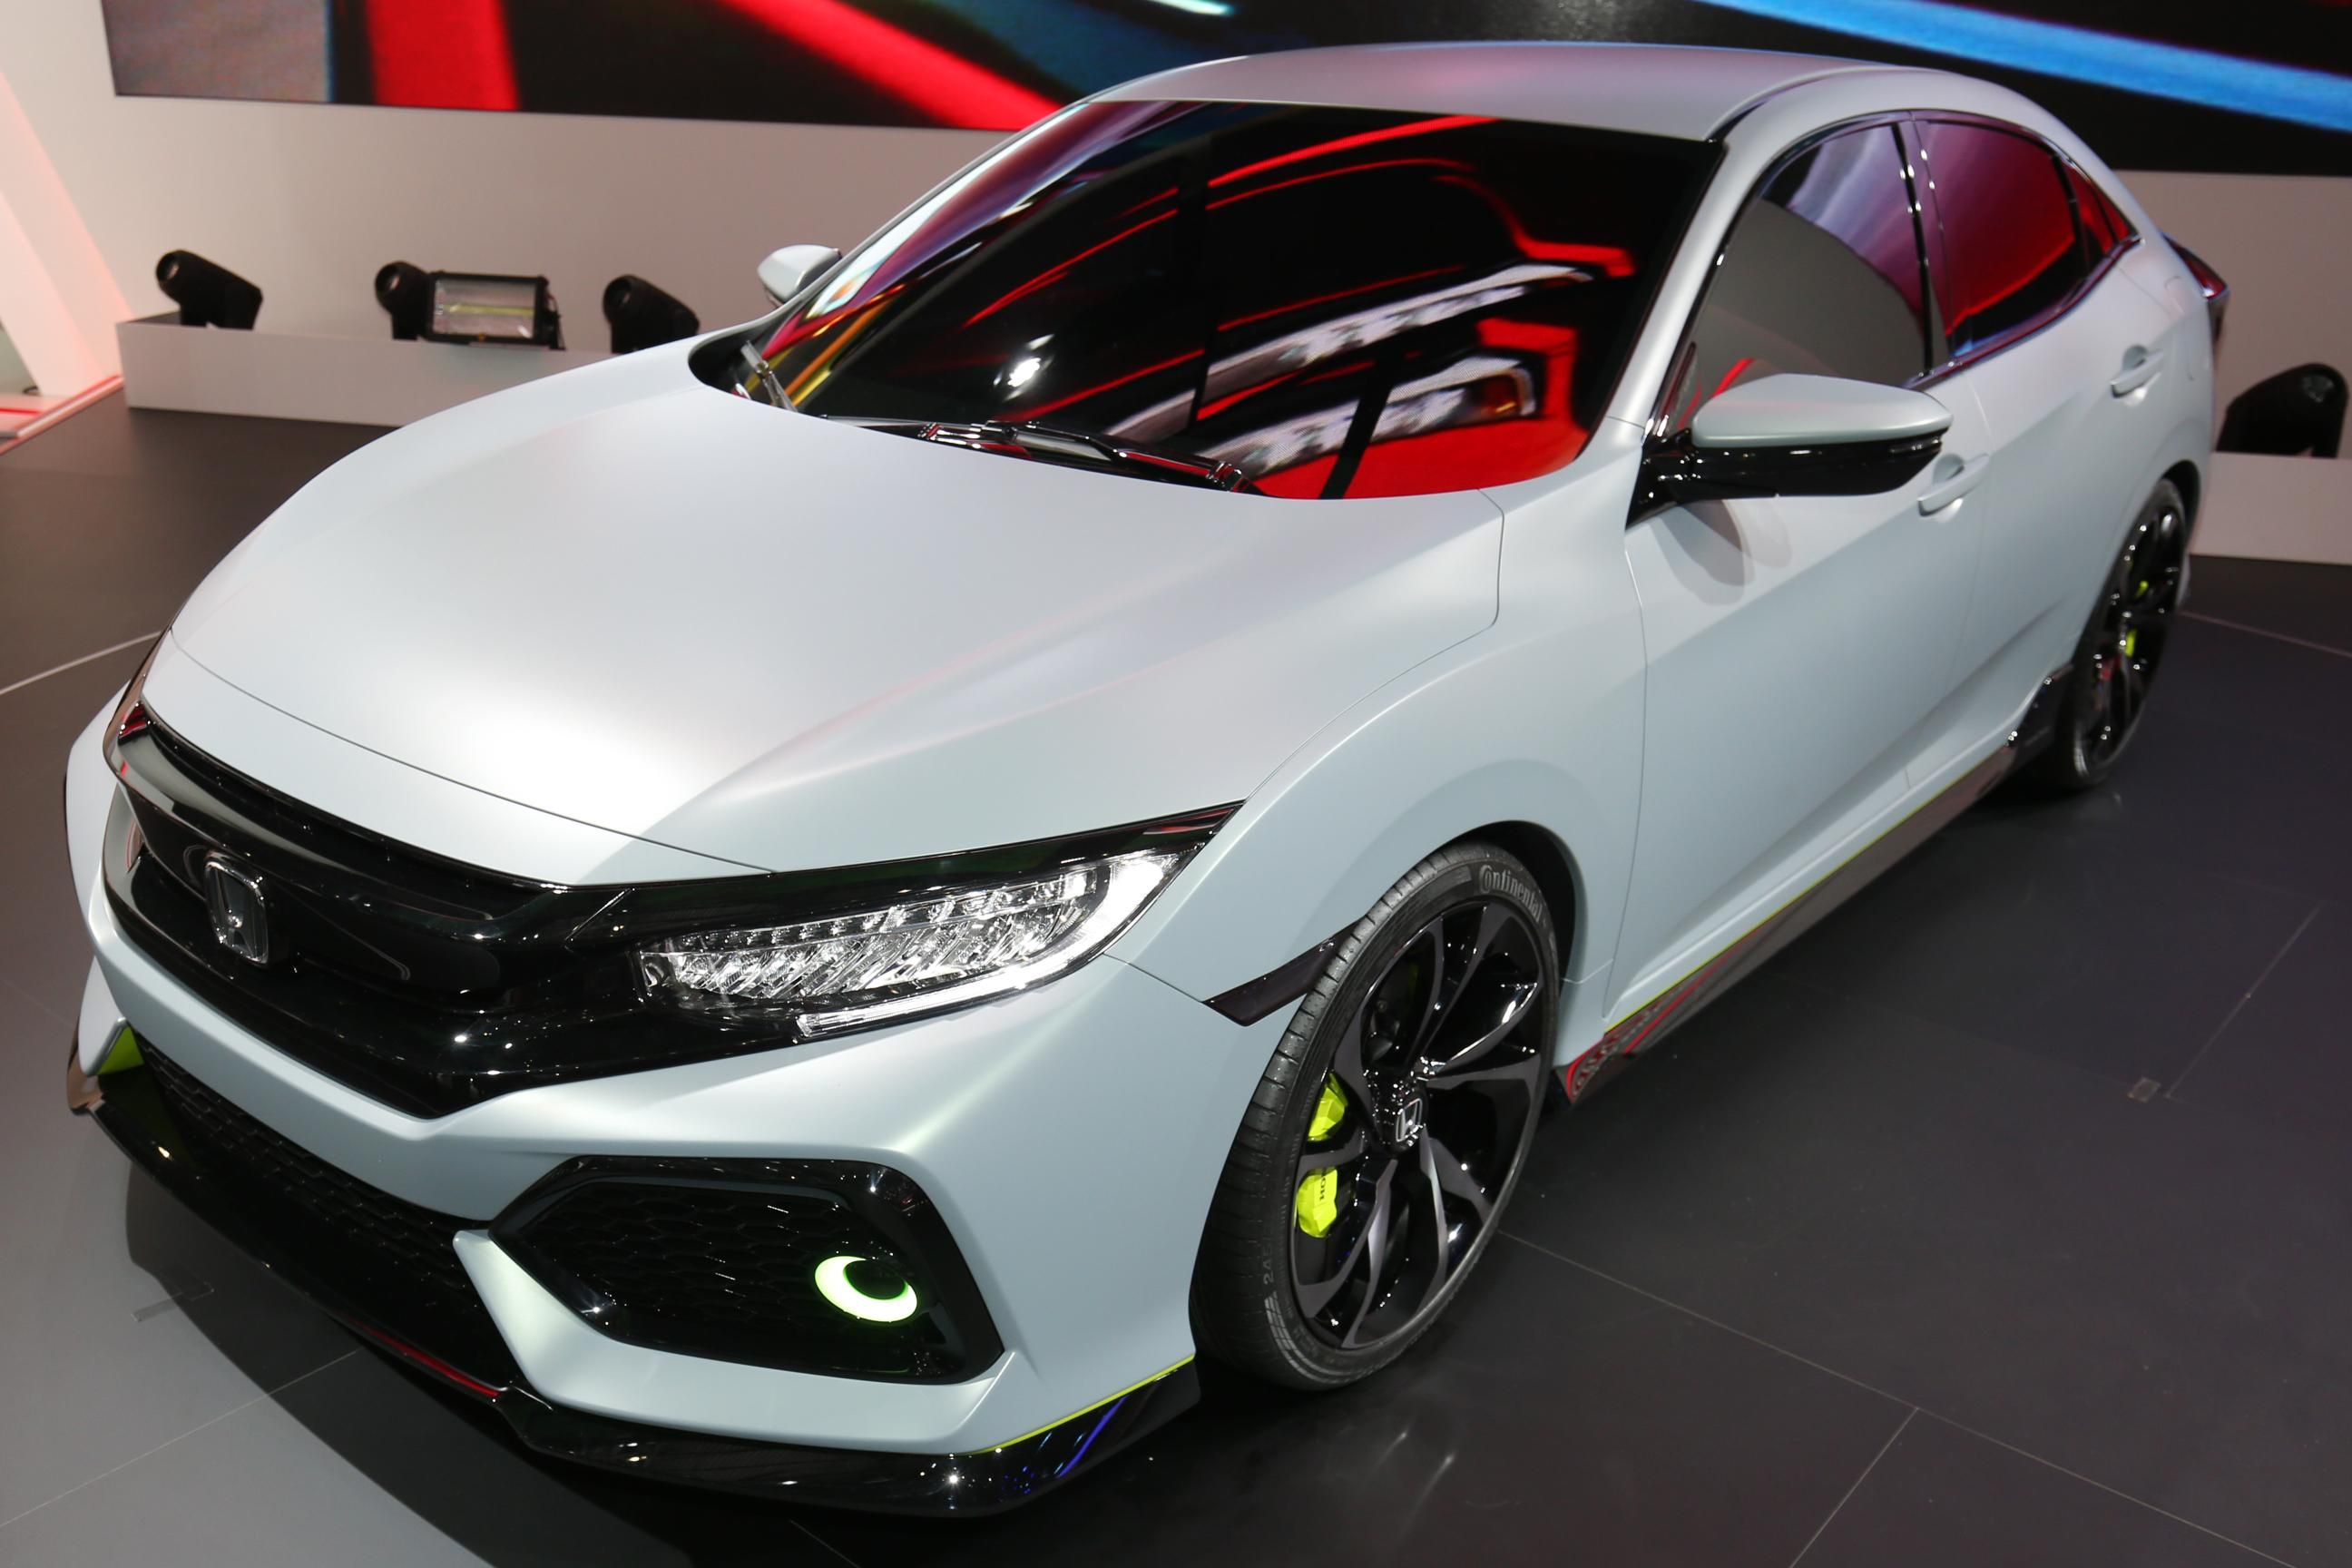 Honda Civic Hatchback Prototype 1